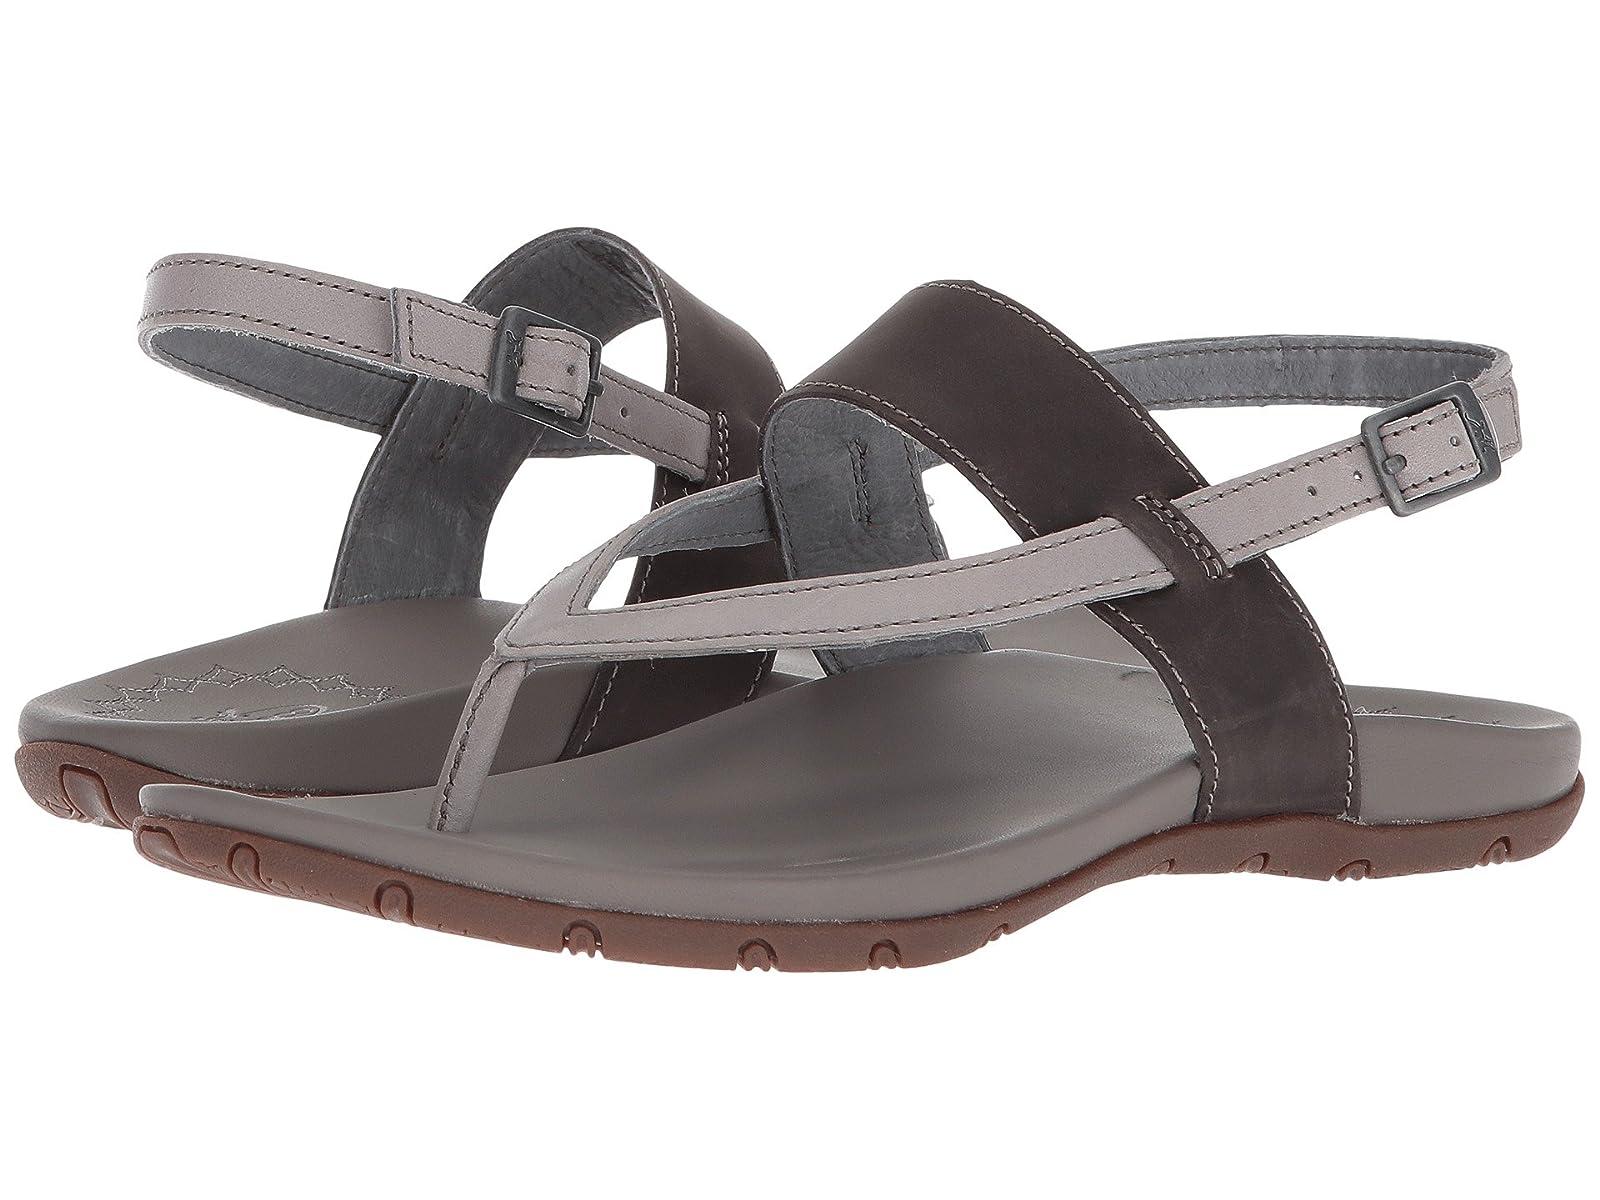 Chaco Maya IIComfortable and distinctive shoes